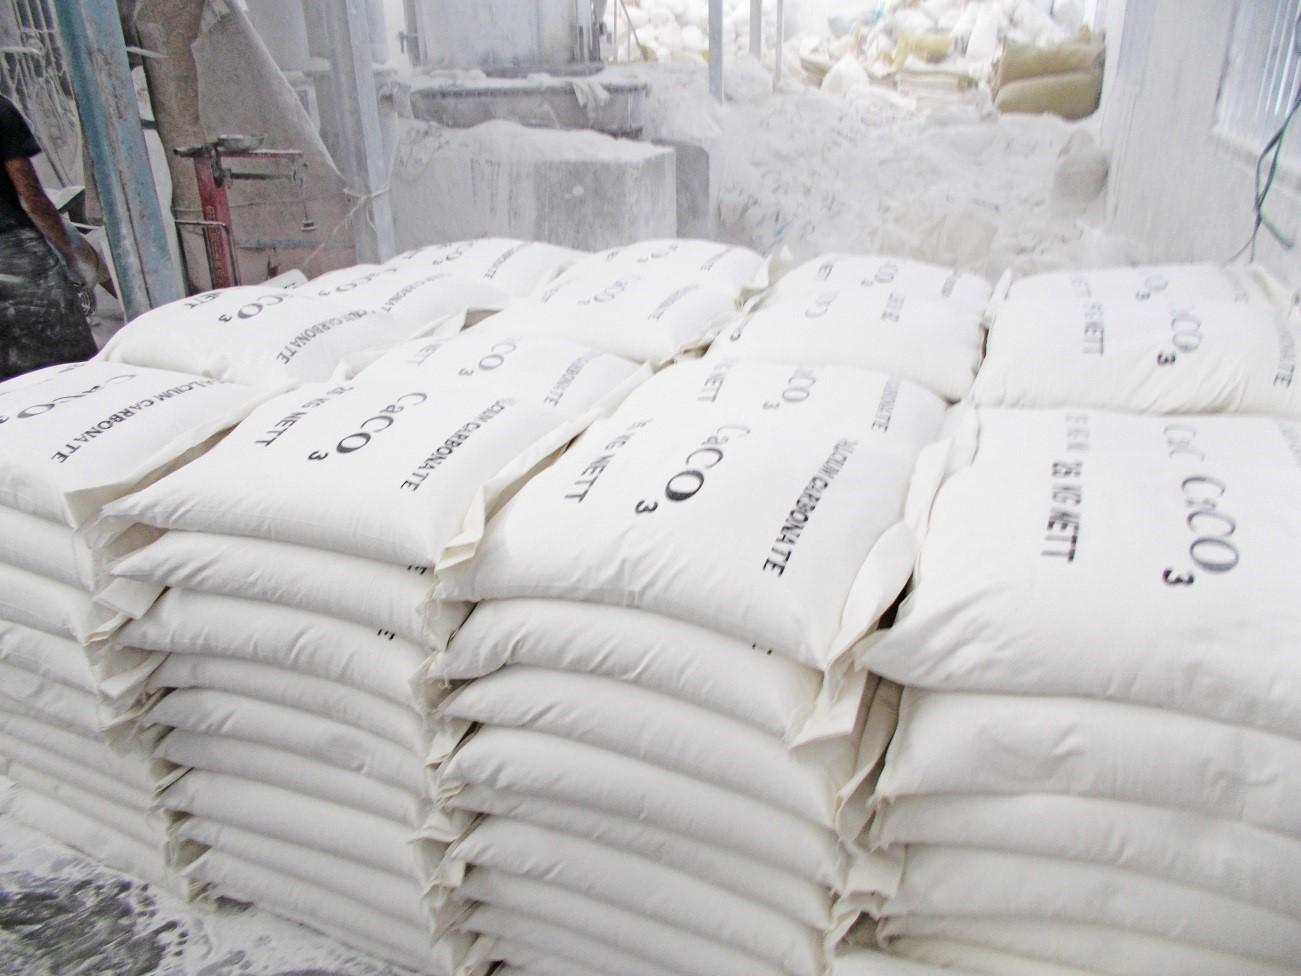 Study Report - Study of Calcium Carbonate (CaCO3) Market in Myanmar 2014